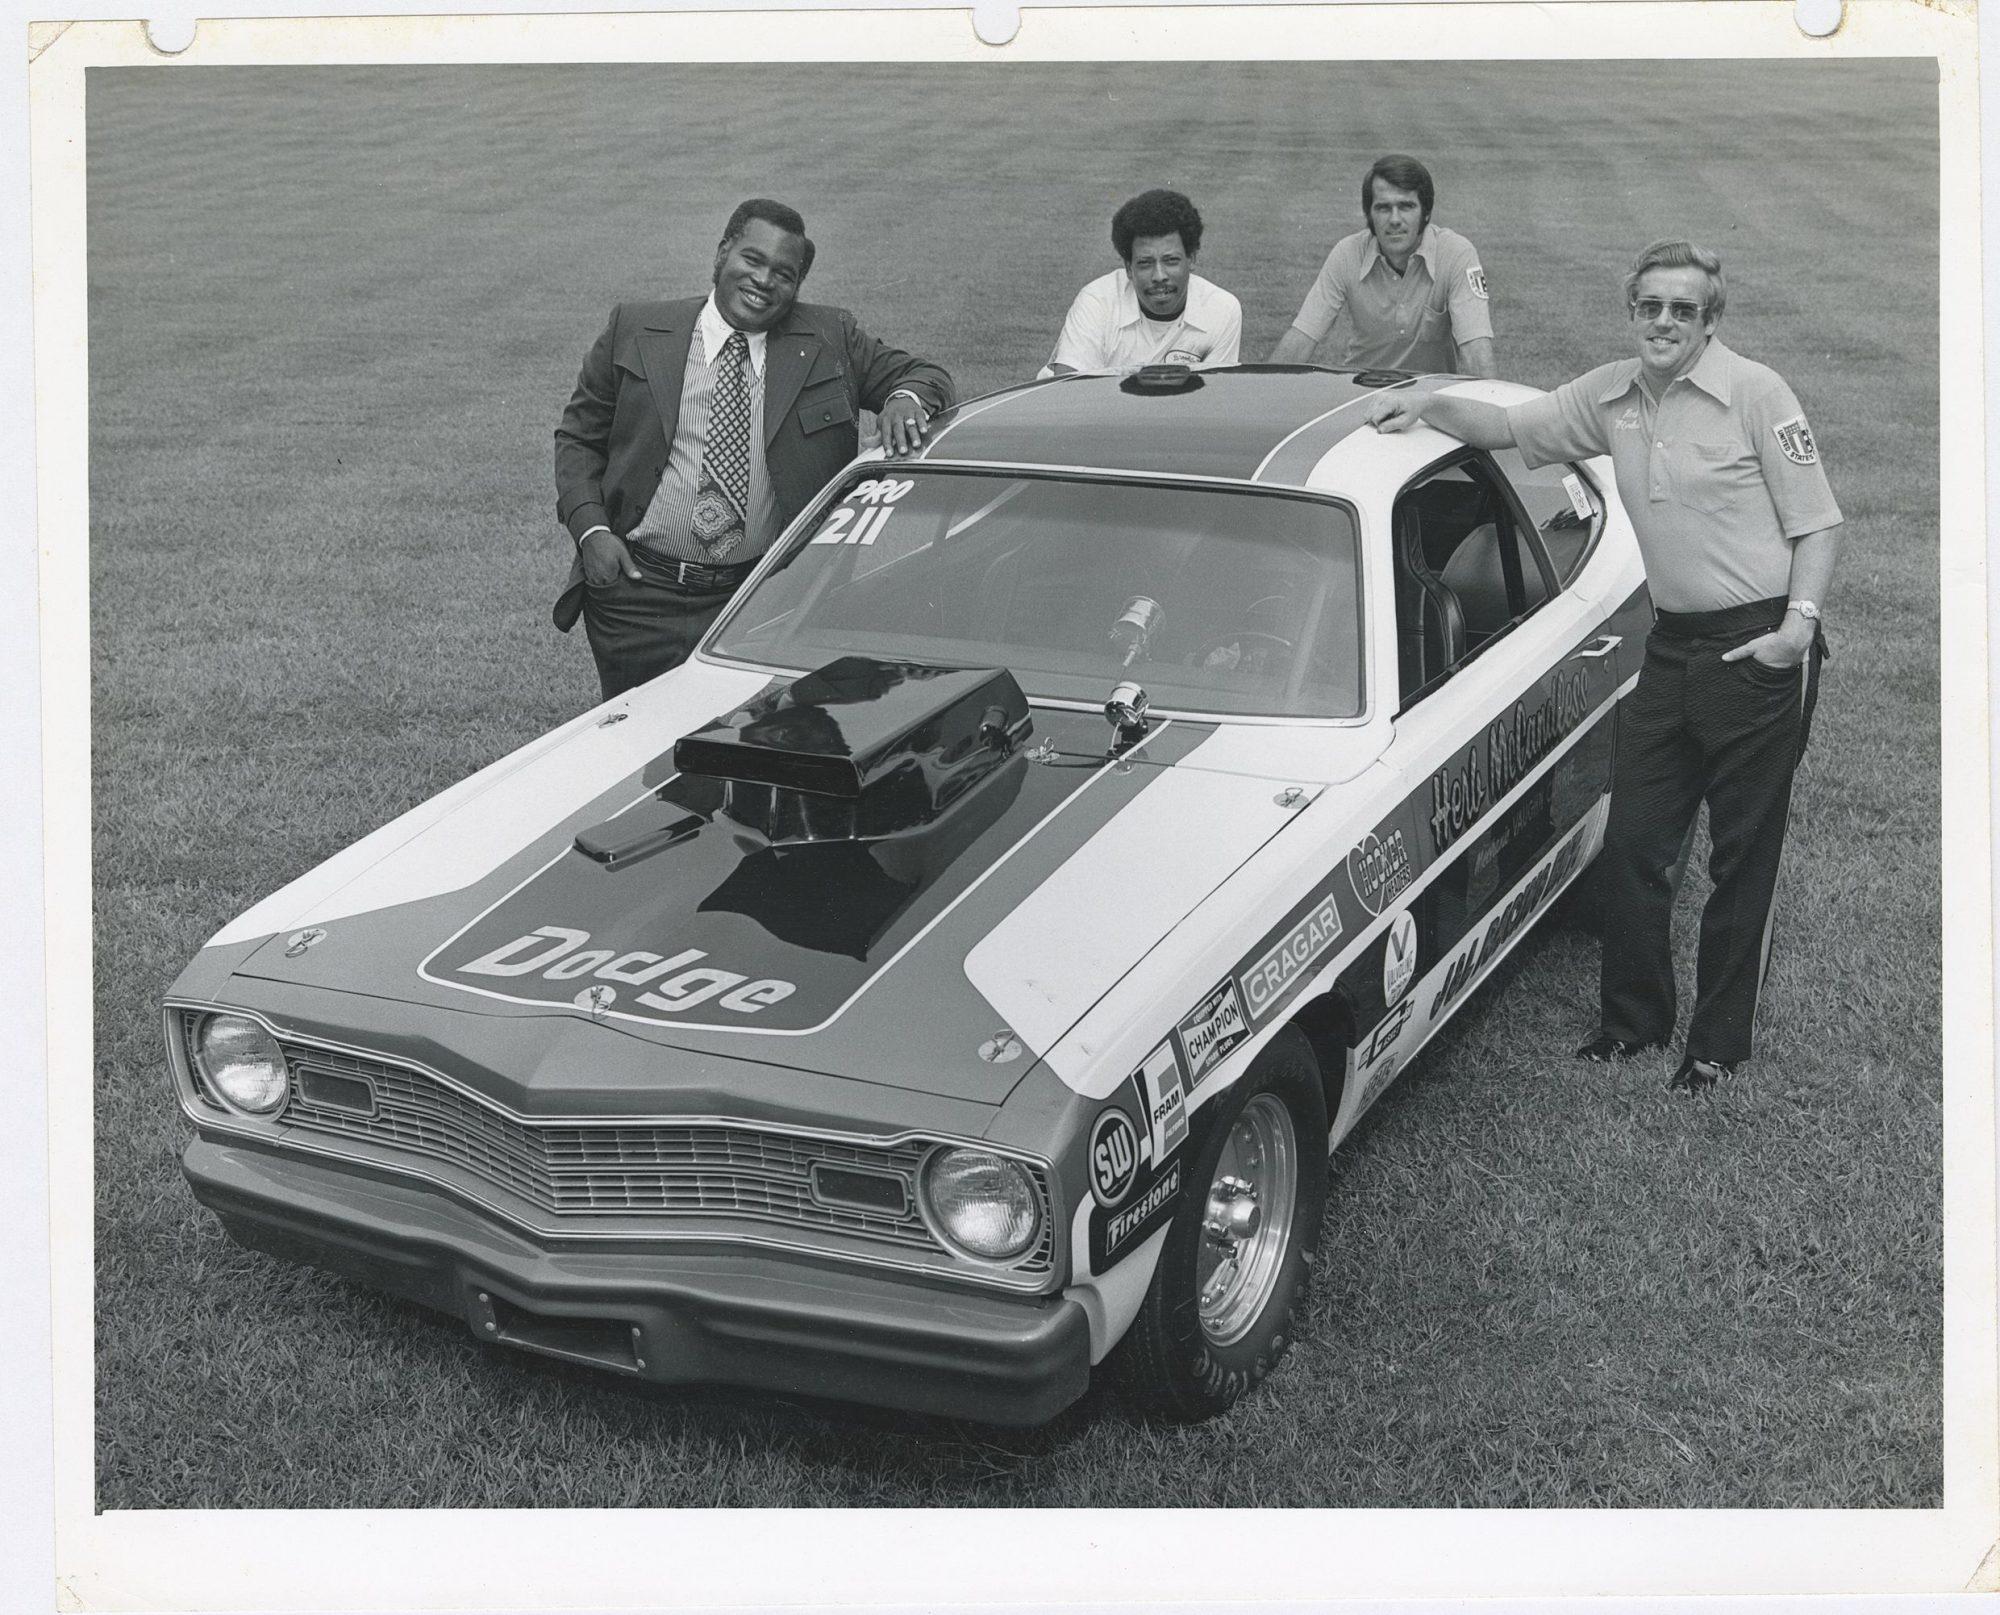 Herb McCandless posing next to his race car